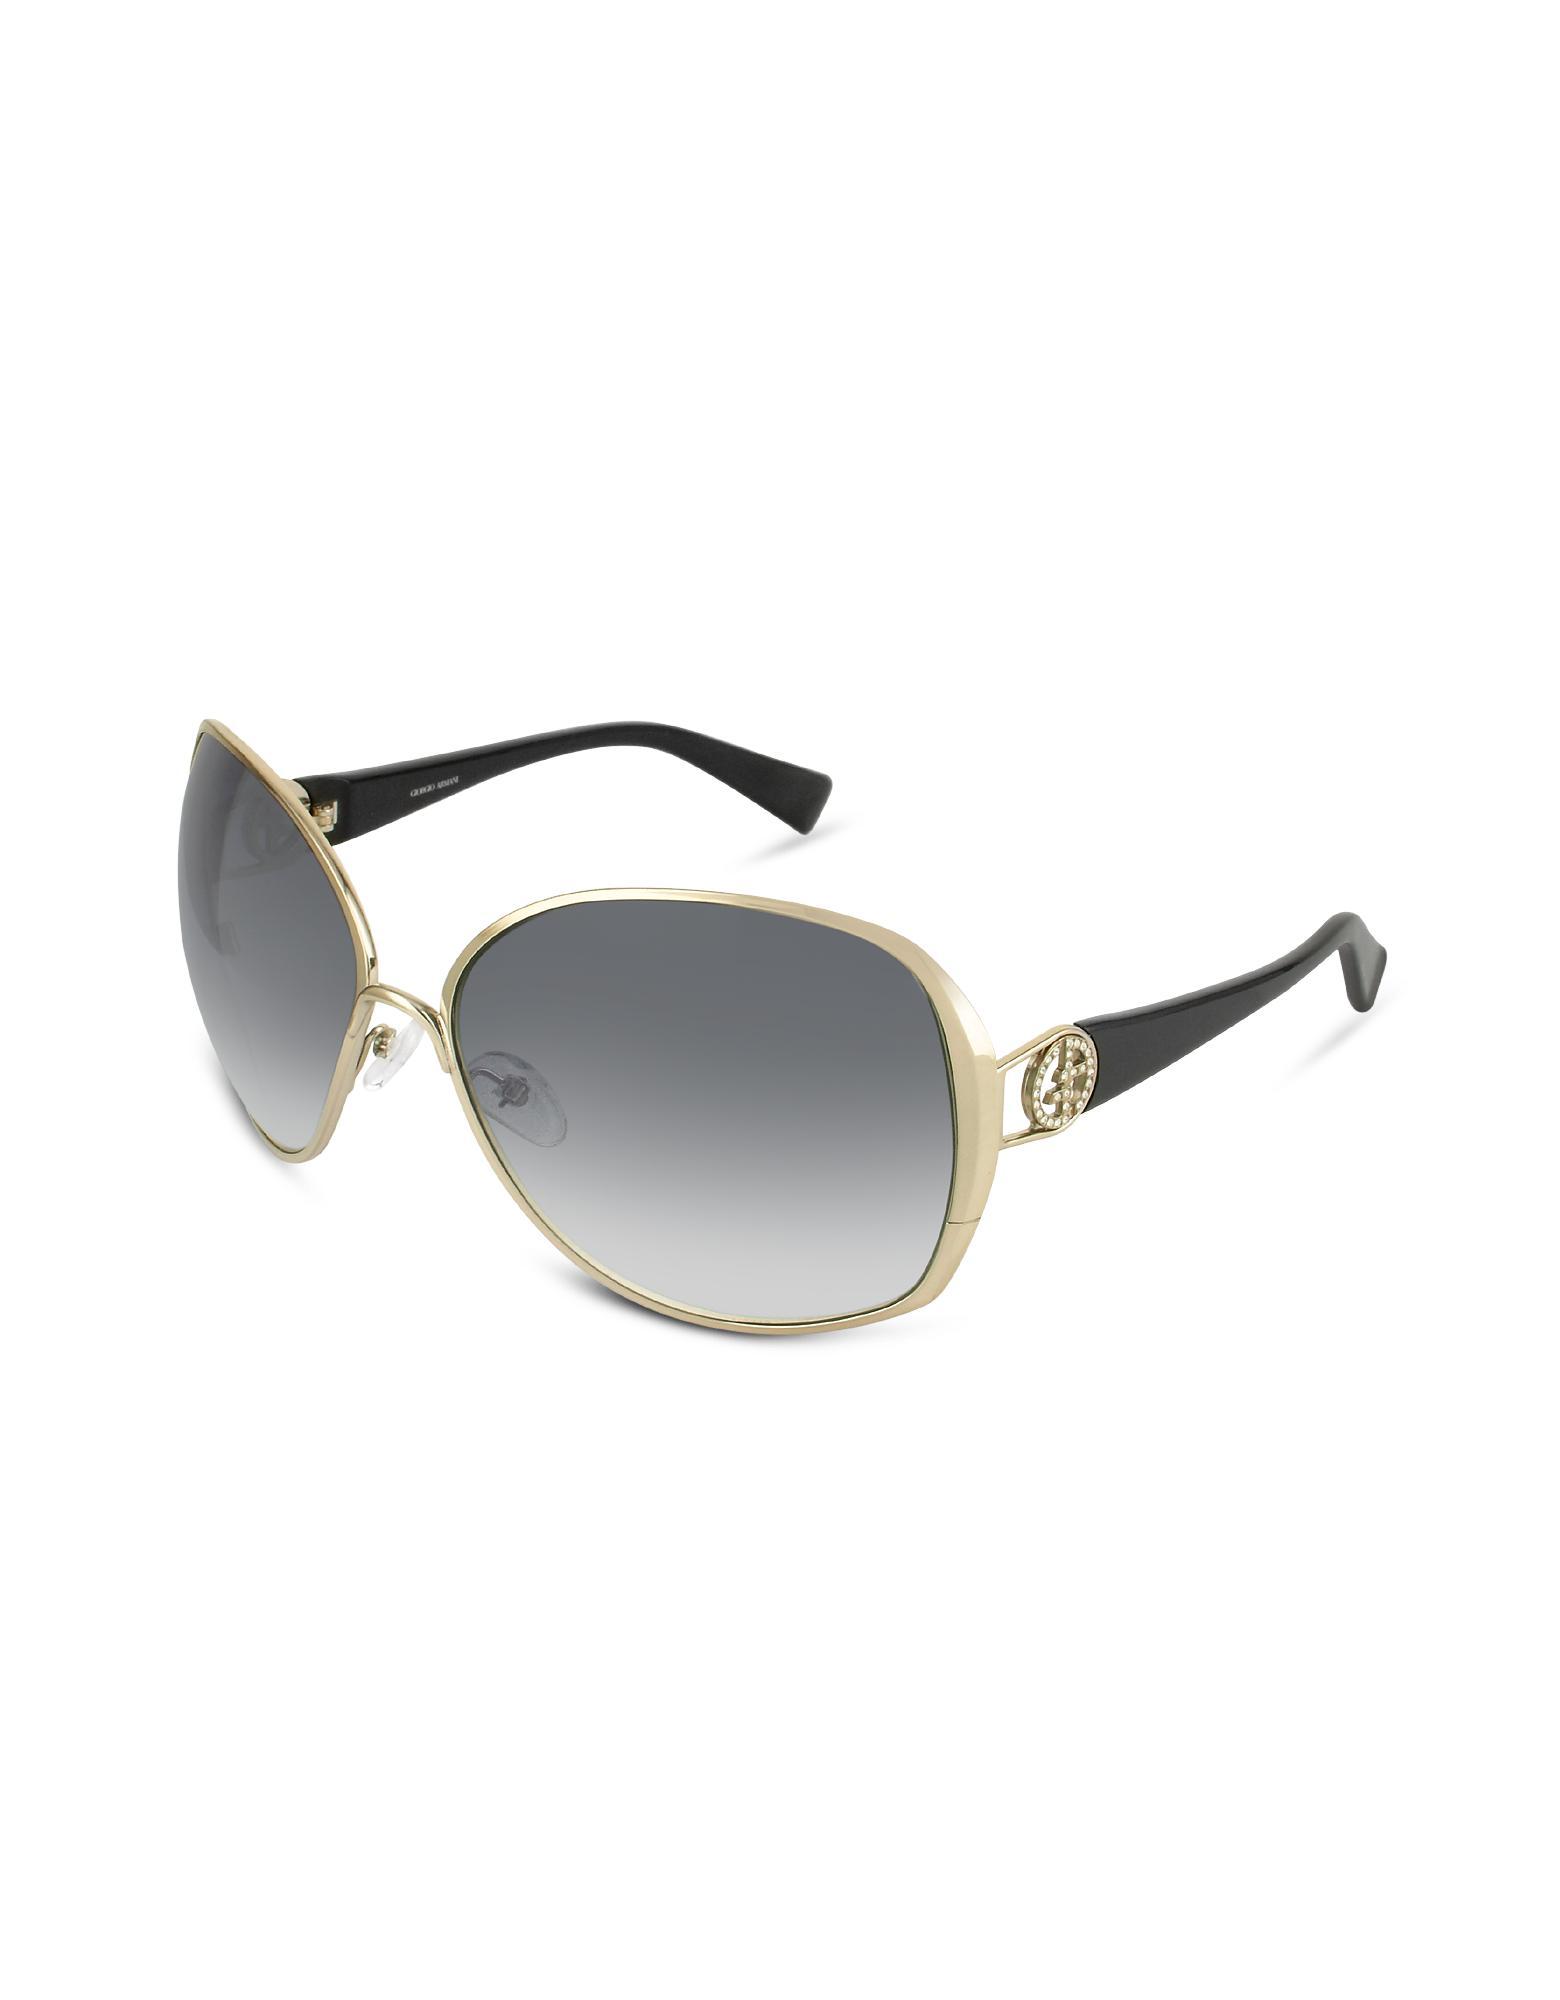 Giorgio Armani  Swarovski Crystal Logo Round Metal Sunglasses